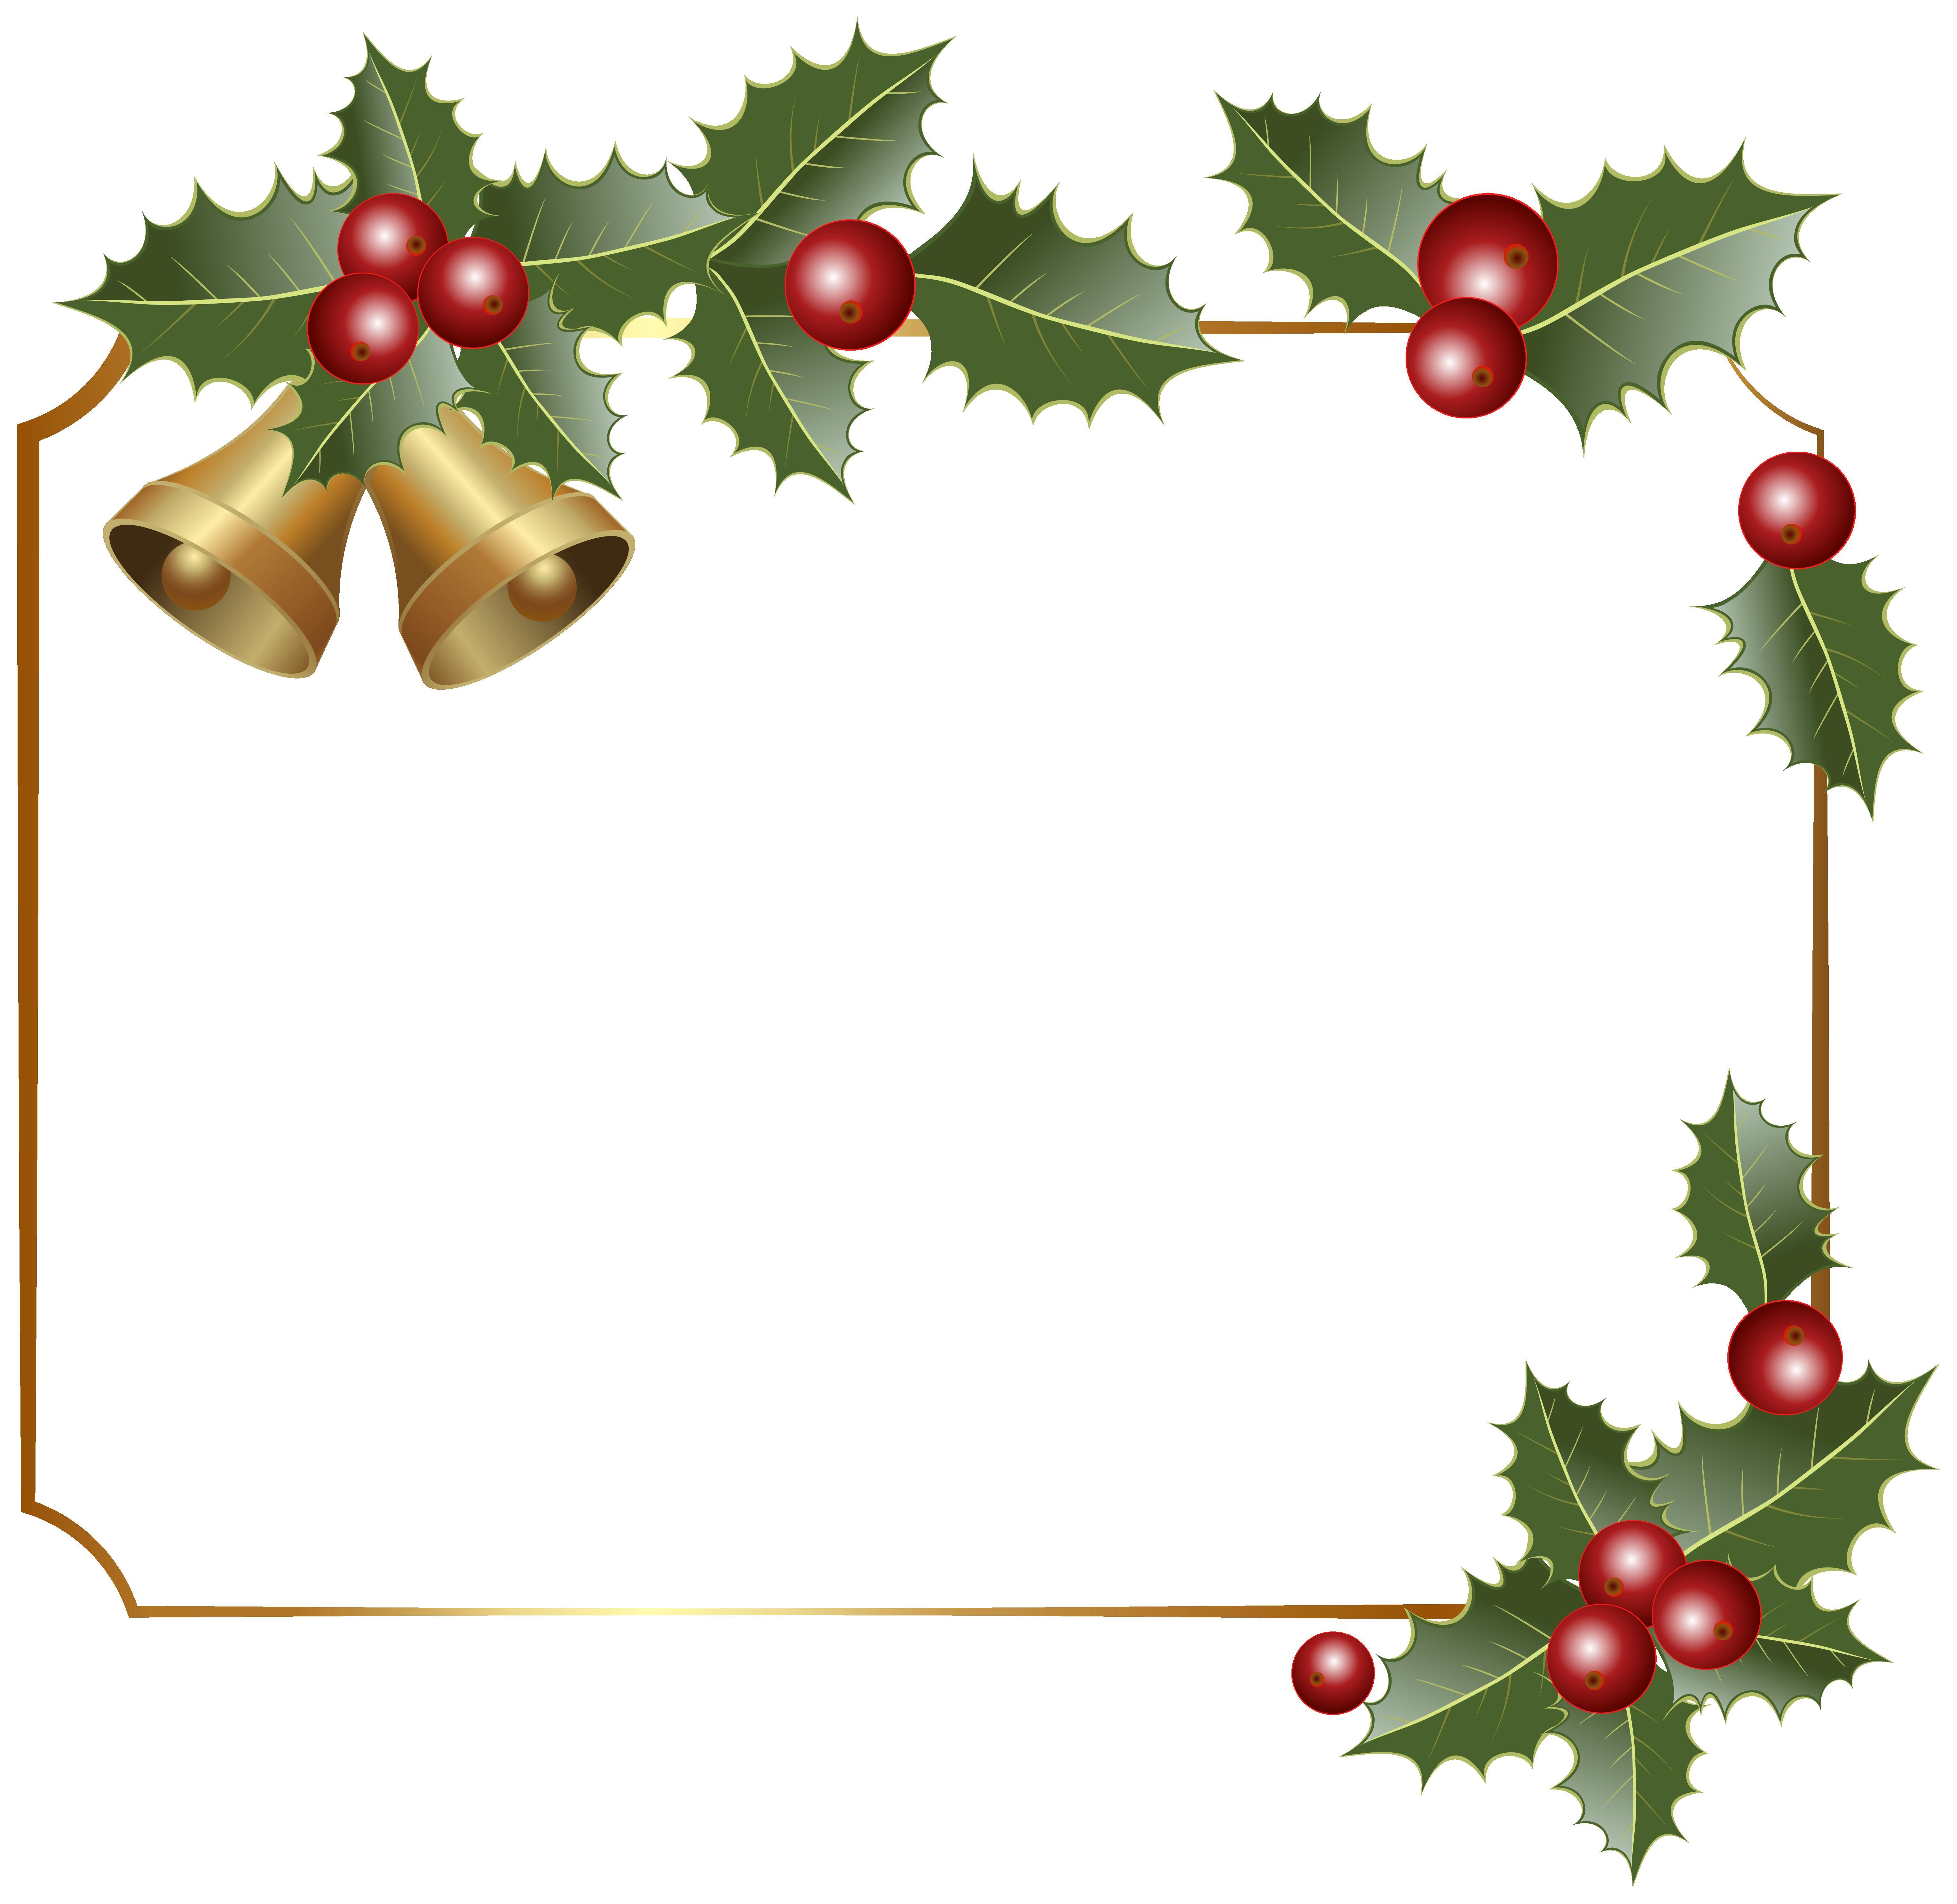 Christmas Bells Border Clipart.